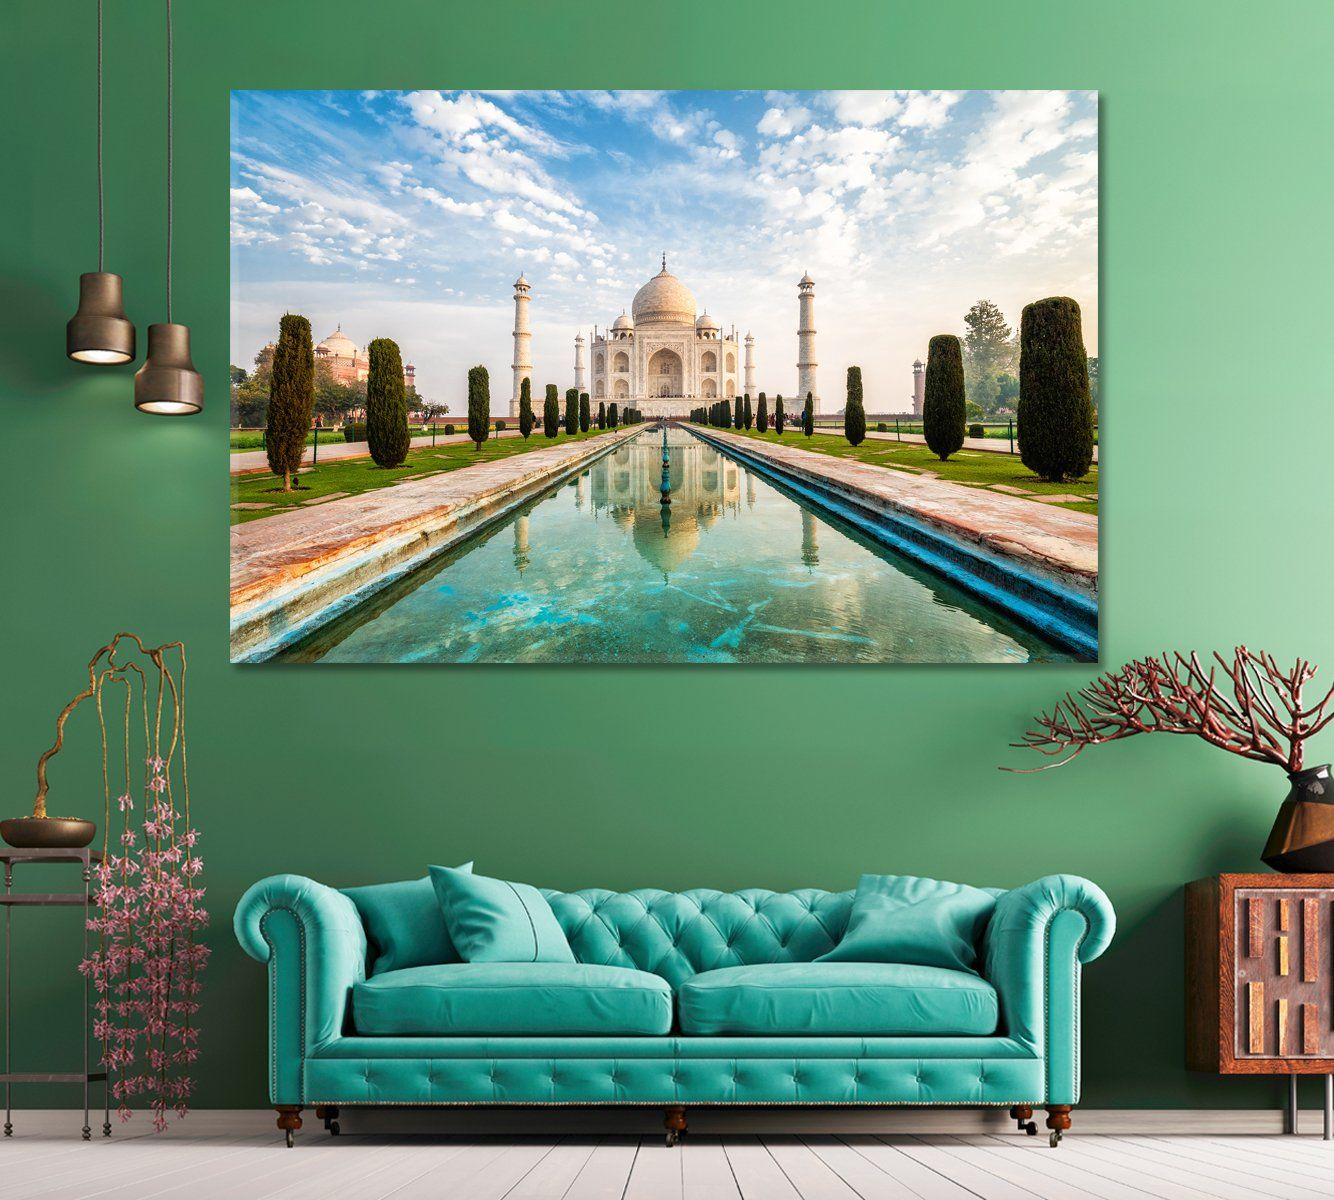 Large Wall Art Taj Mahal Agra India 5 Panels 71 X48 In 2020 Large Wall Art Large Canvas Prints Agra